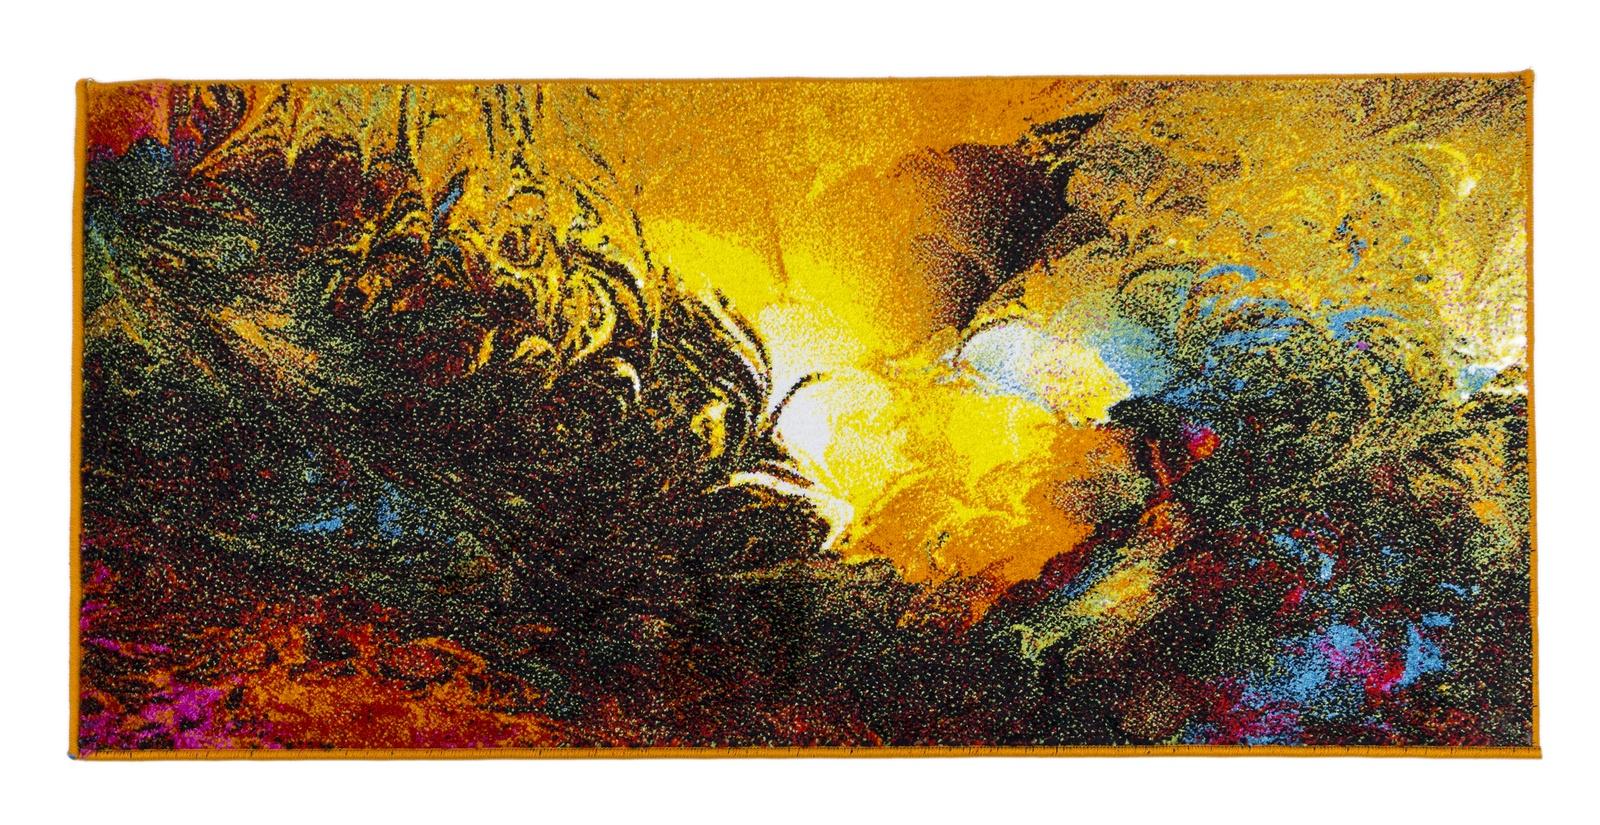 Ковер MADONNA 1,2х1.8 м /прямоугольник, бежевый, желтый, красный